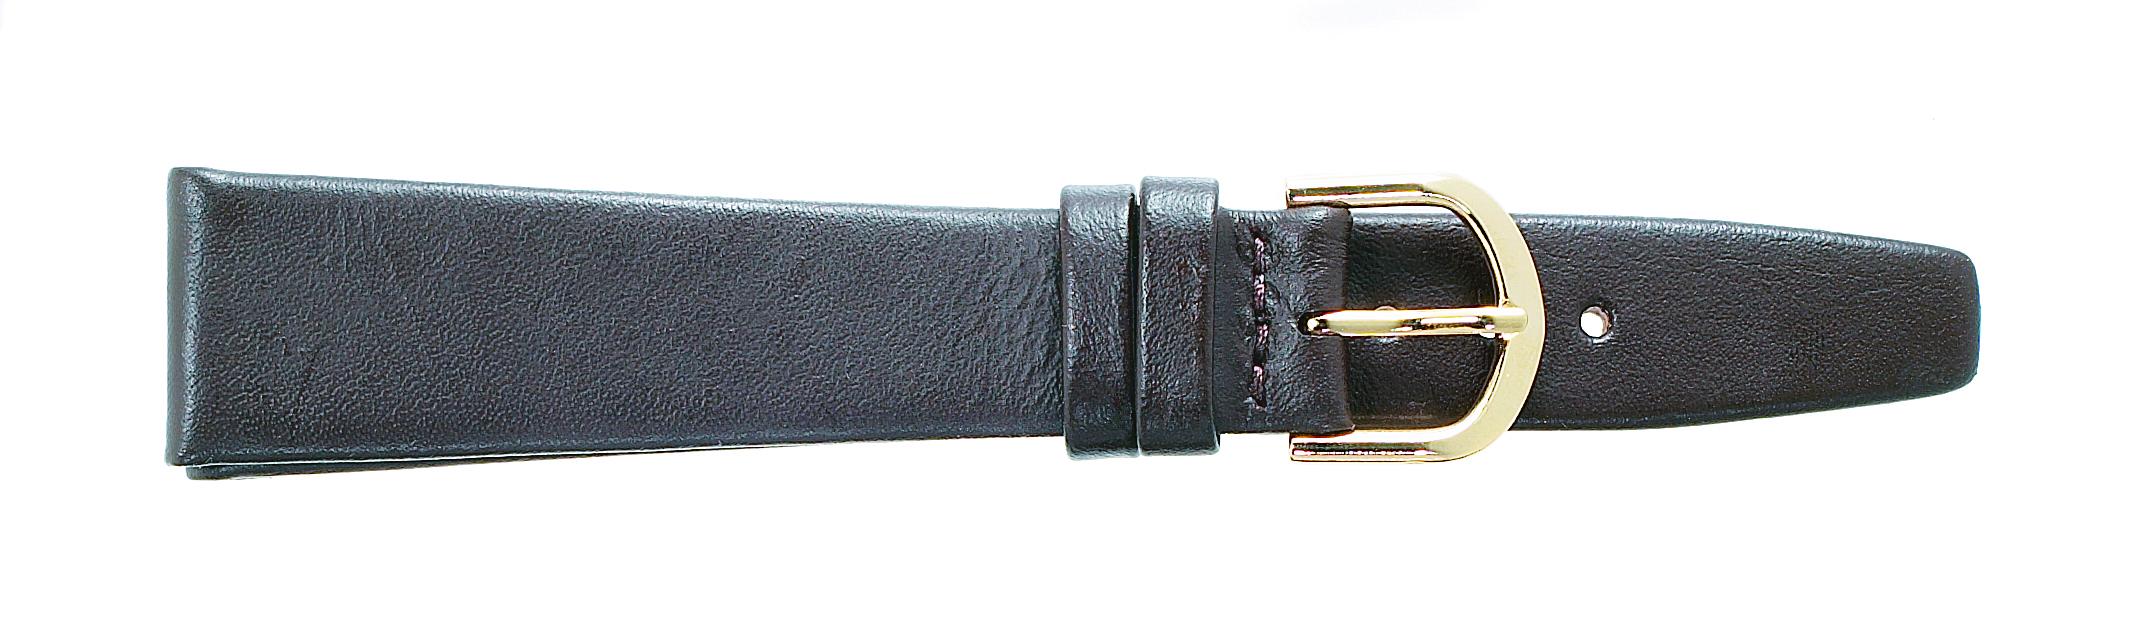 18mm Flat Calf Brown Strap-0